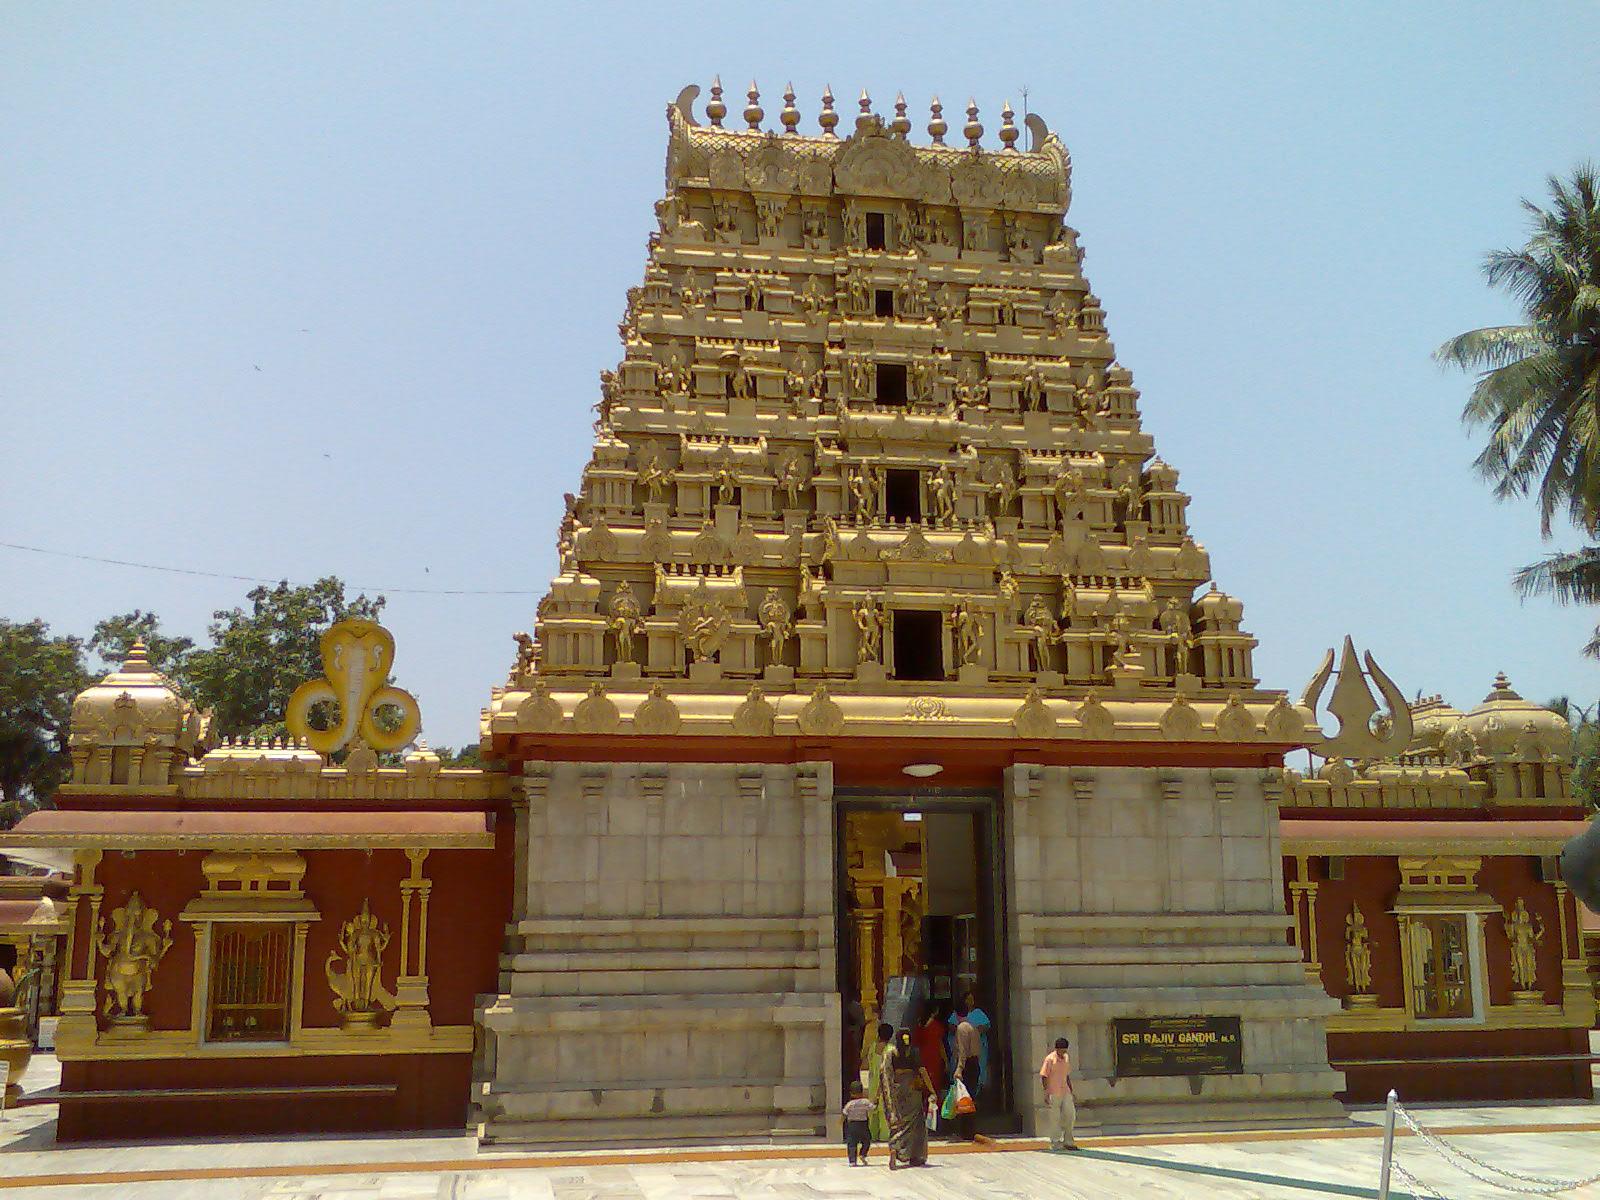 Mangalore | Top Places to visit in Mangalore | Mangaluru Beaches